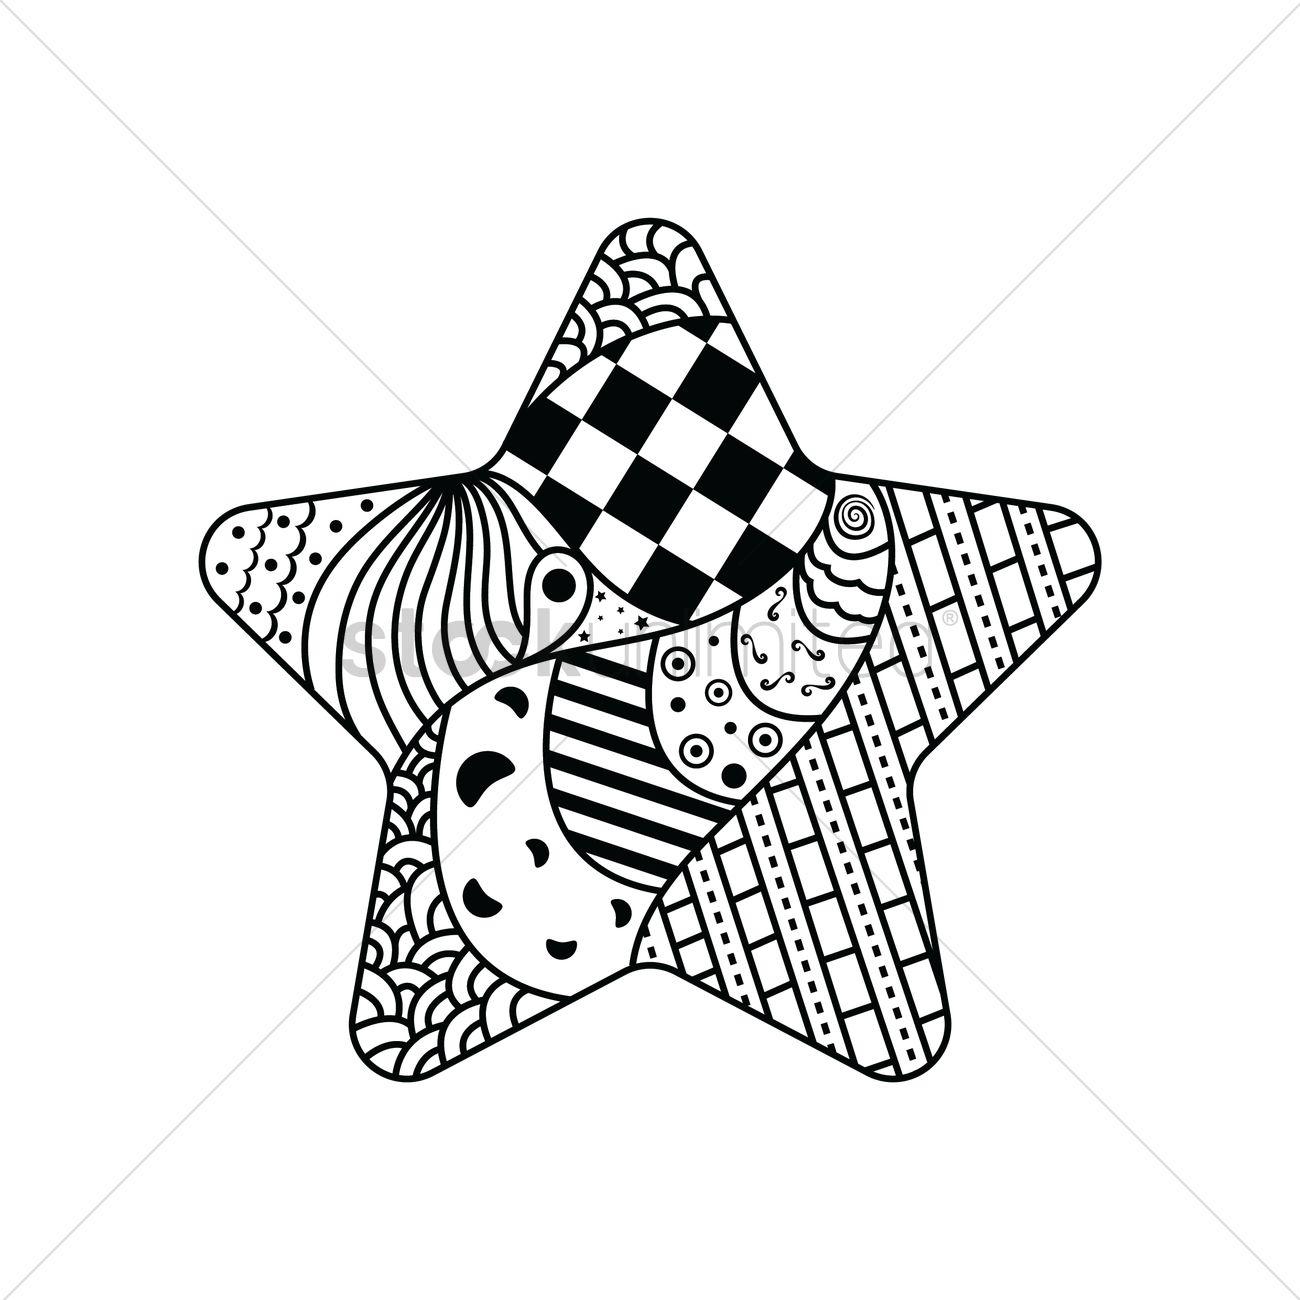 1300x1300 Free Decorative Star Design Vector Image